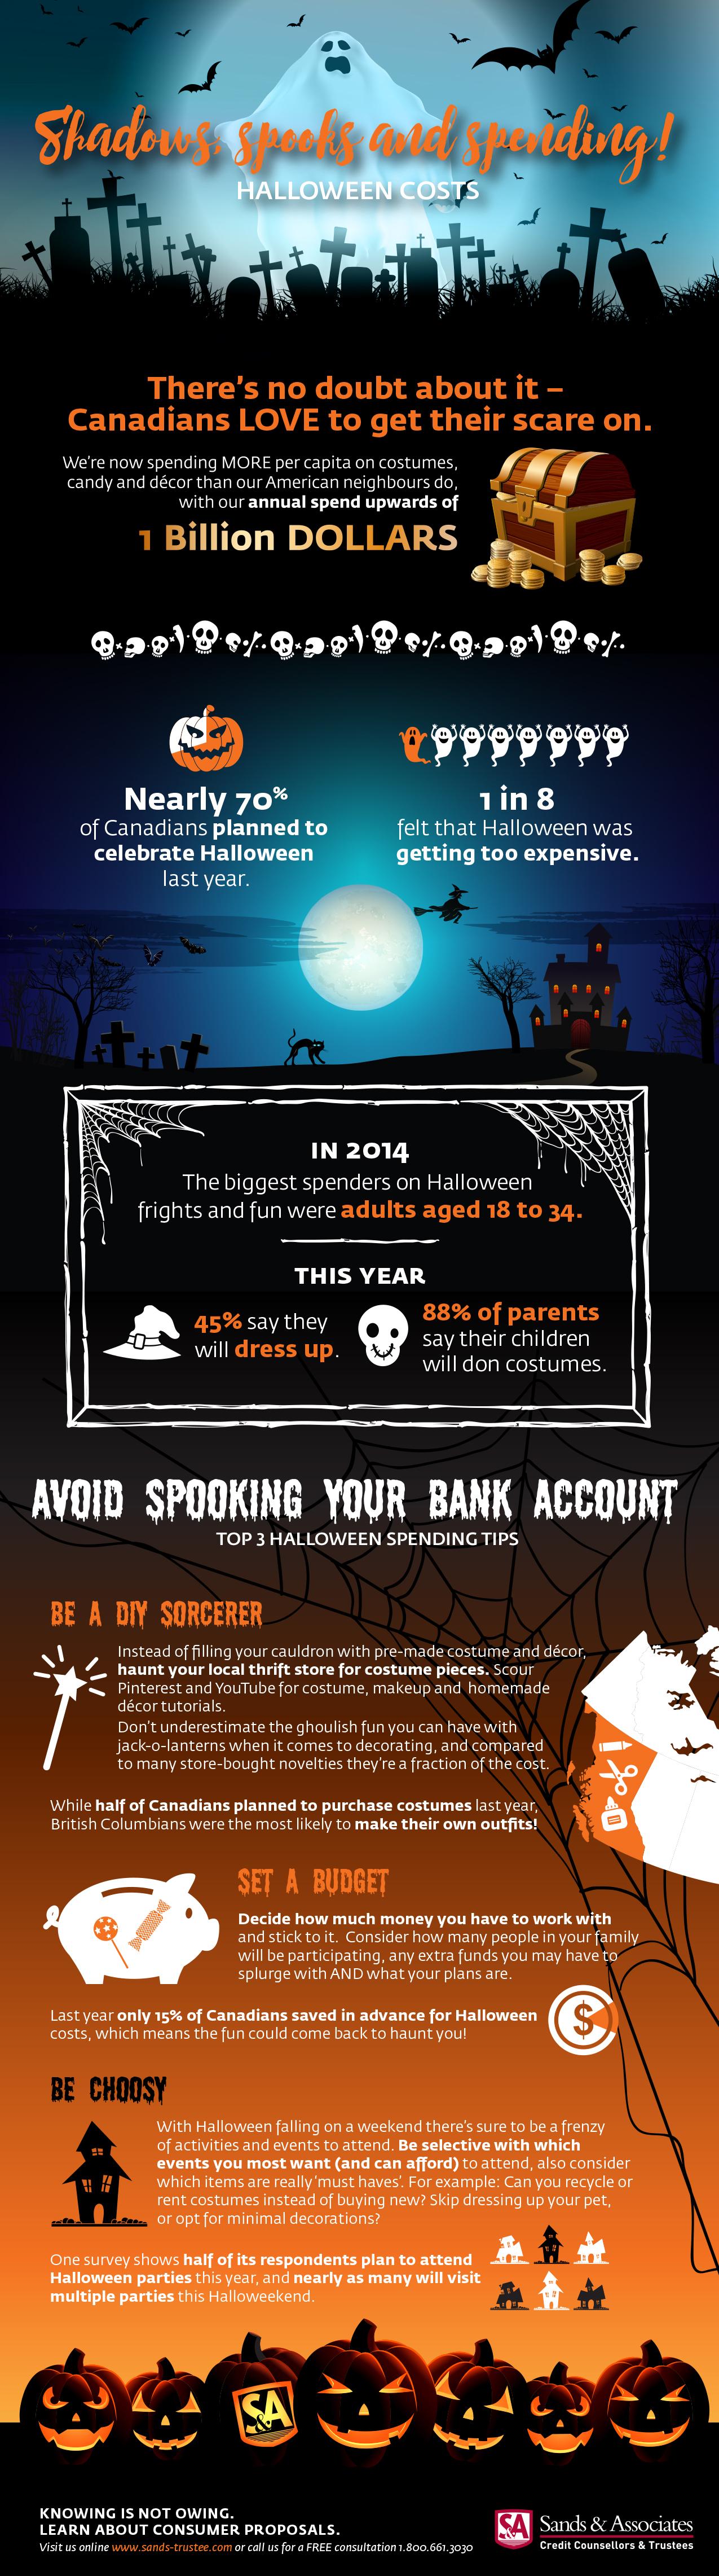 Halloween Spending Costs Infographic from Sands & Associates